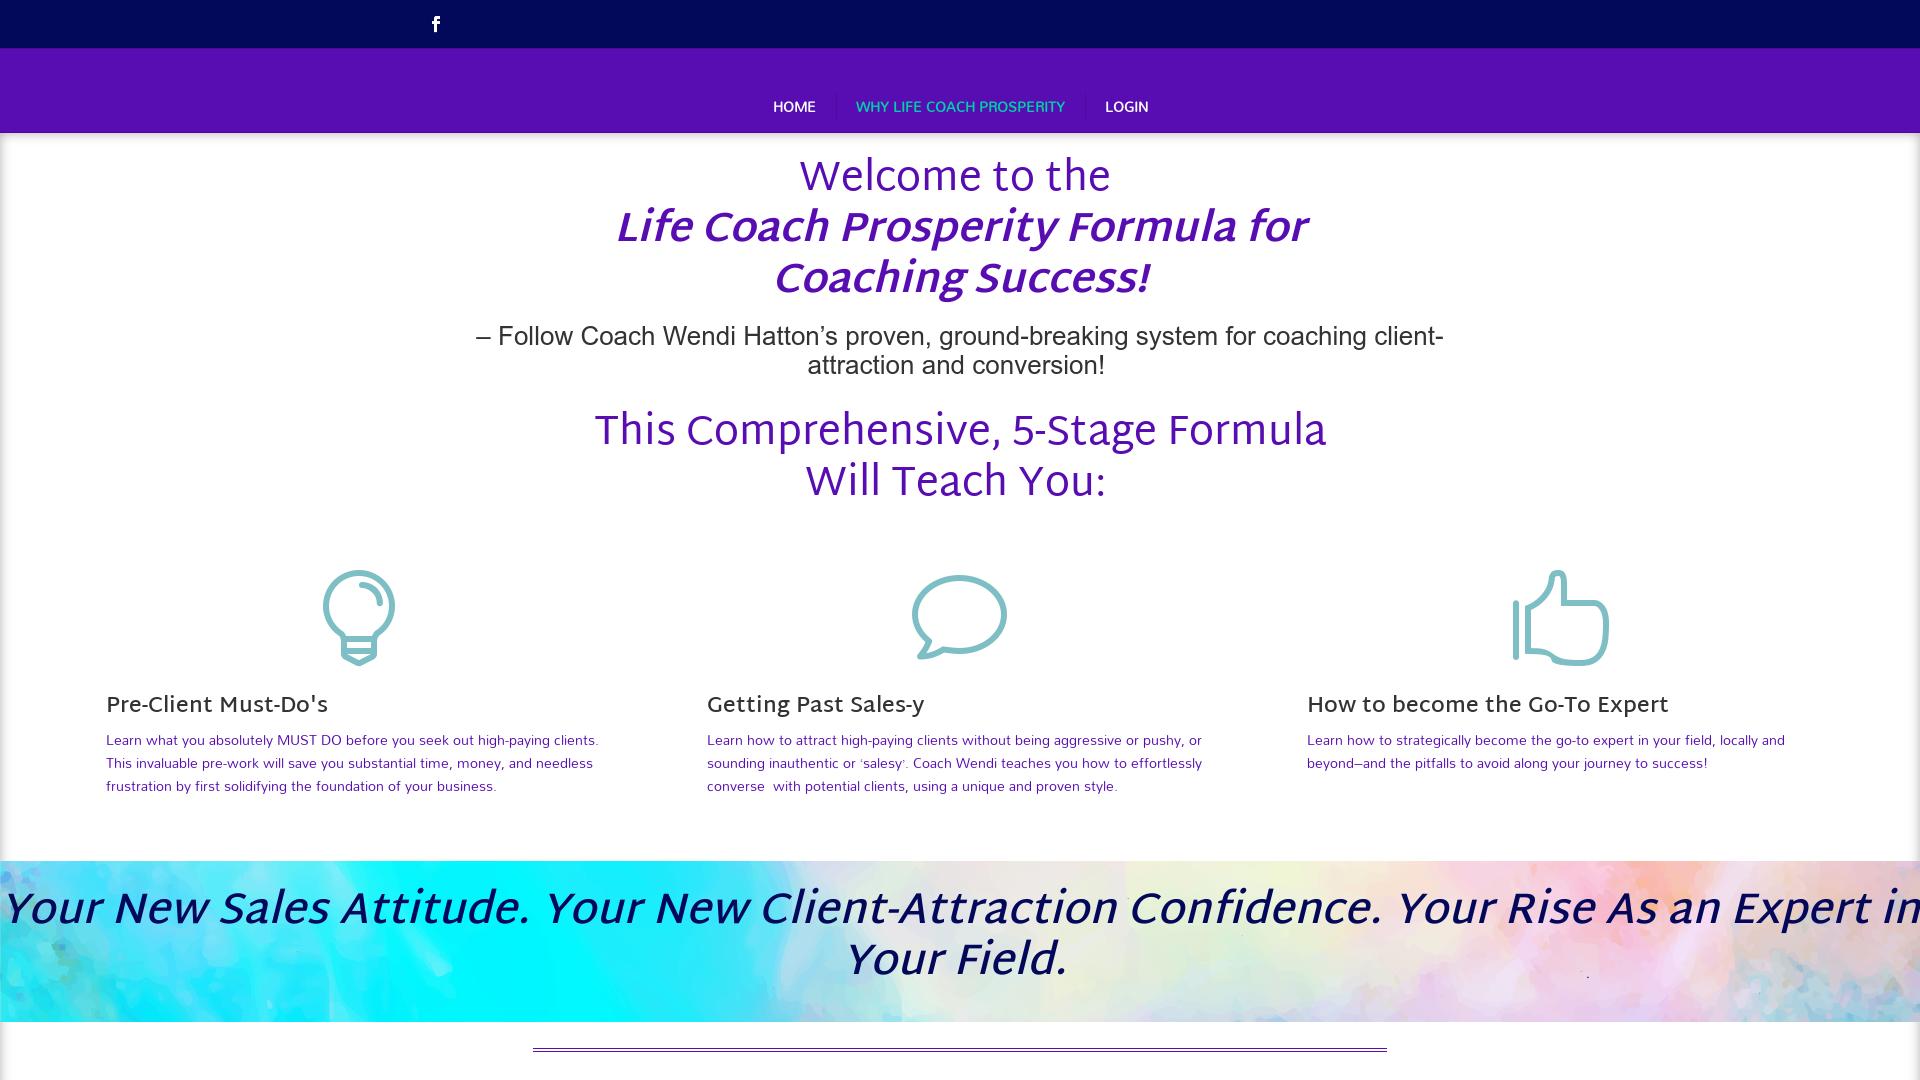 lifecoachprosperity-com-1920x1080desktop-704c0b